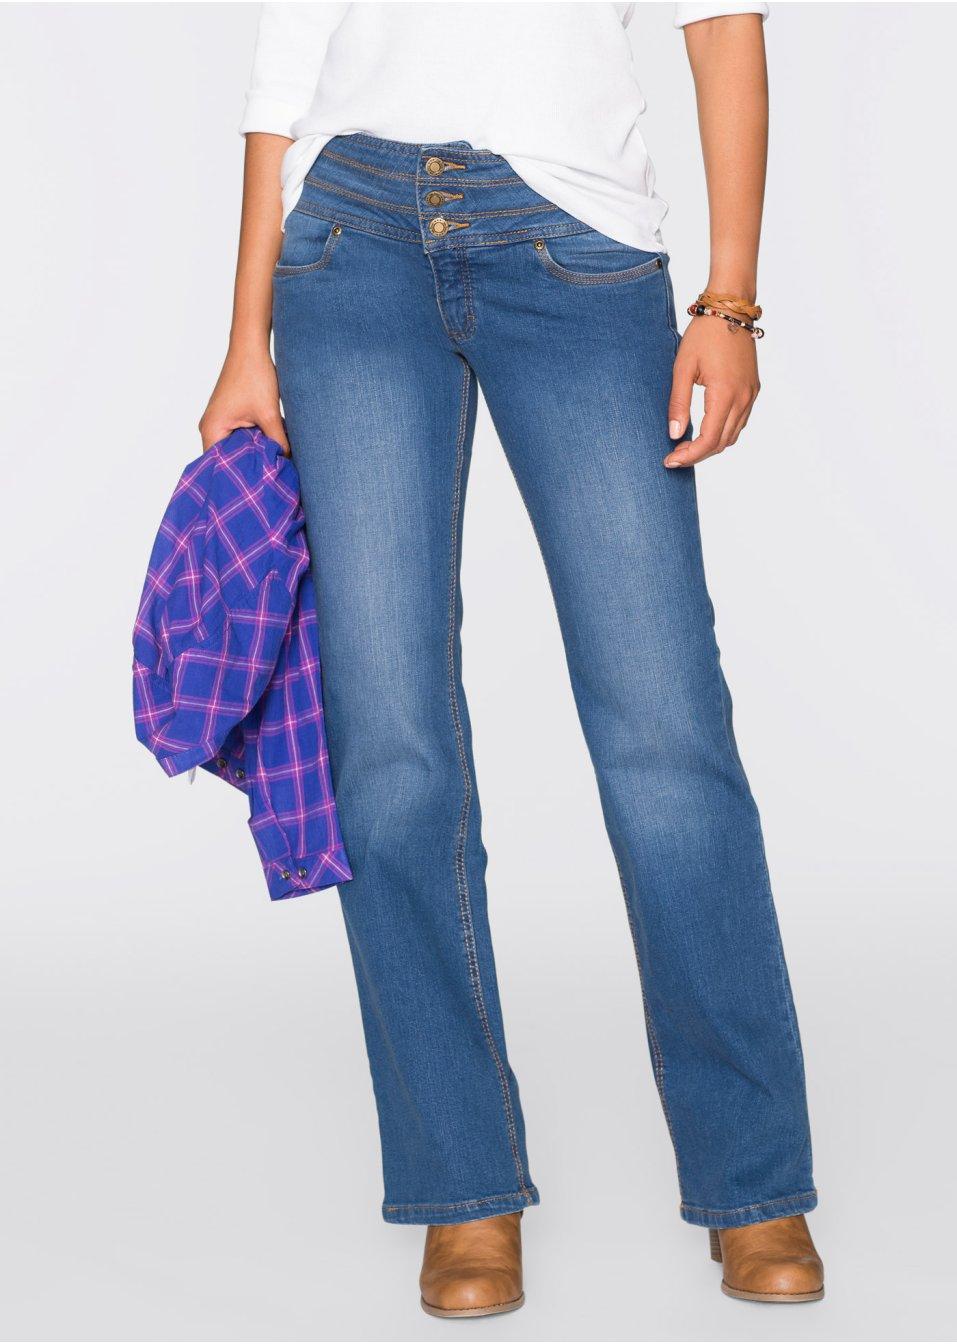 tolle stretch jeans mit bauch weg effekt hellblau lang. Black Bedroom Furniture Sets. Home Design Ideas